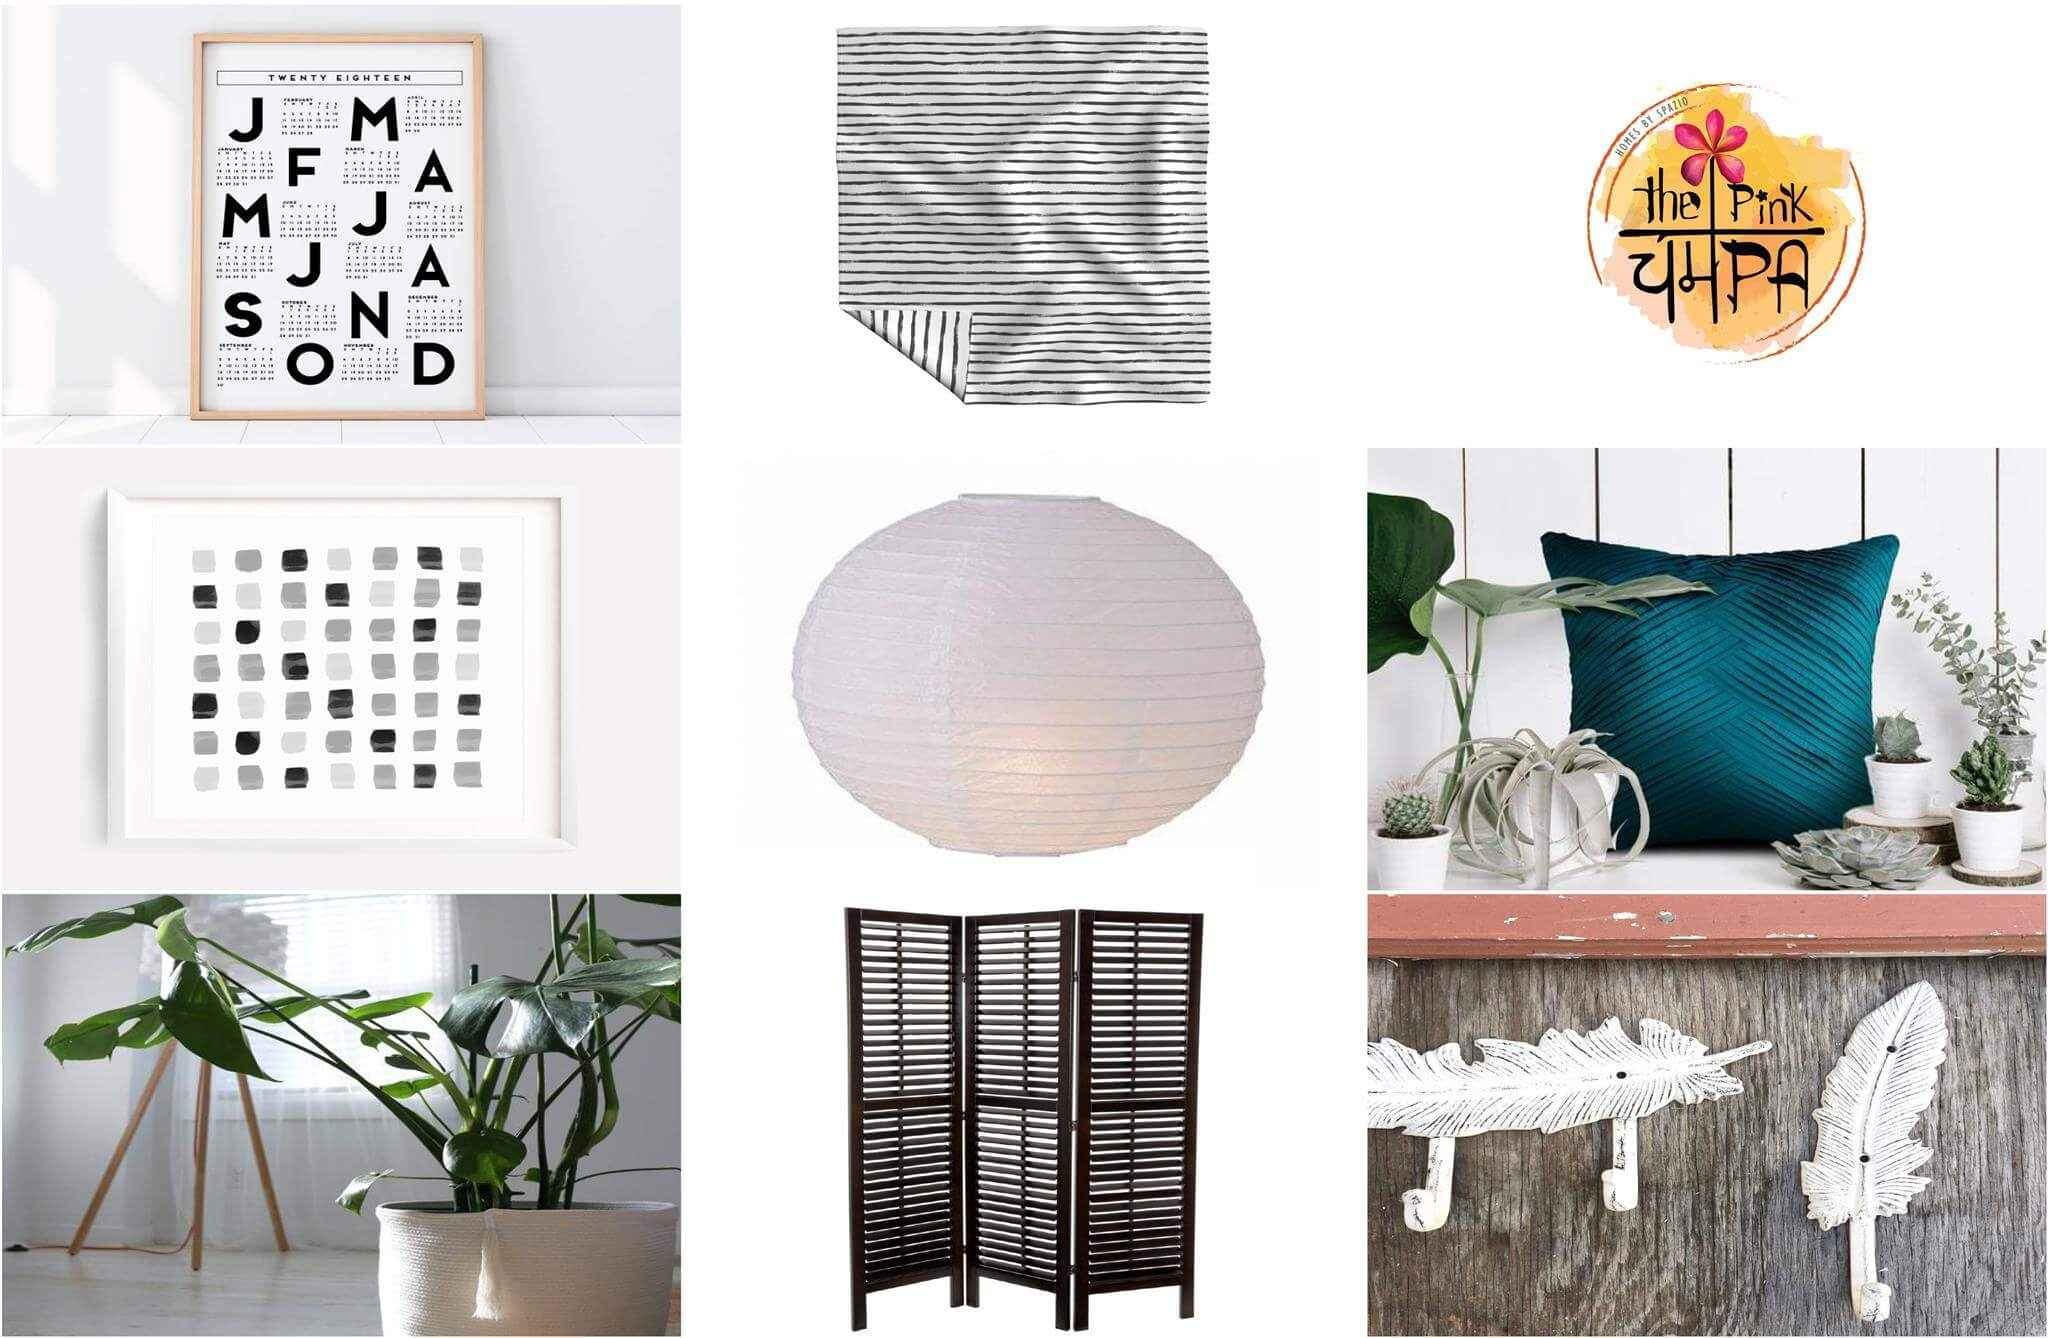 8 Examples of Scandinavian Home Decor